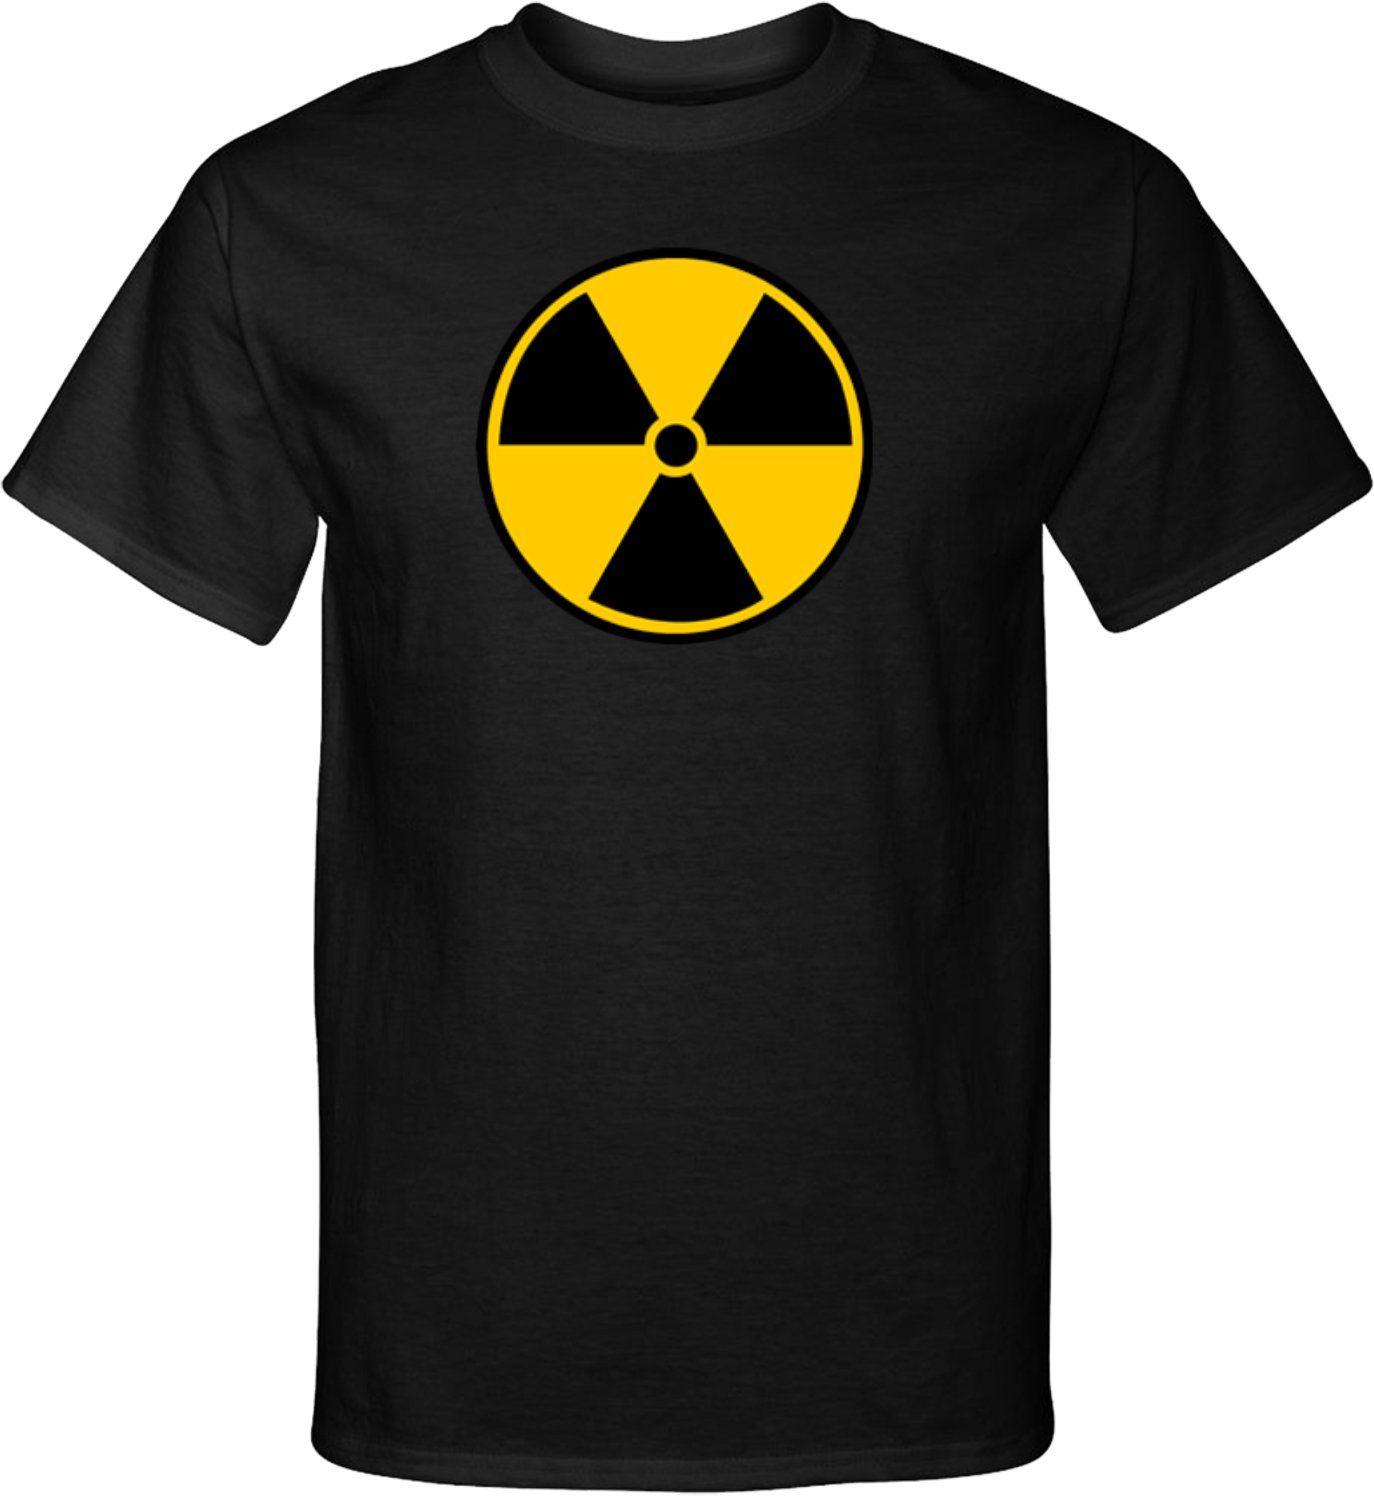 Radiation tshirt radioactive fallout symbol tall tee